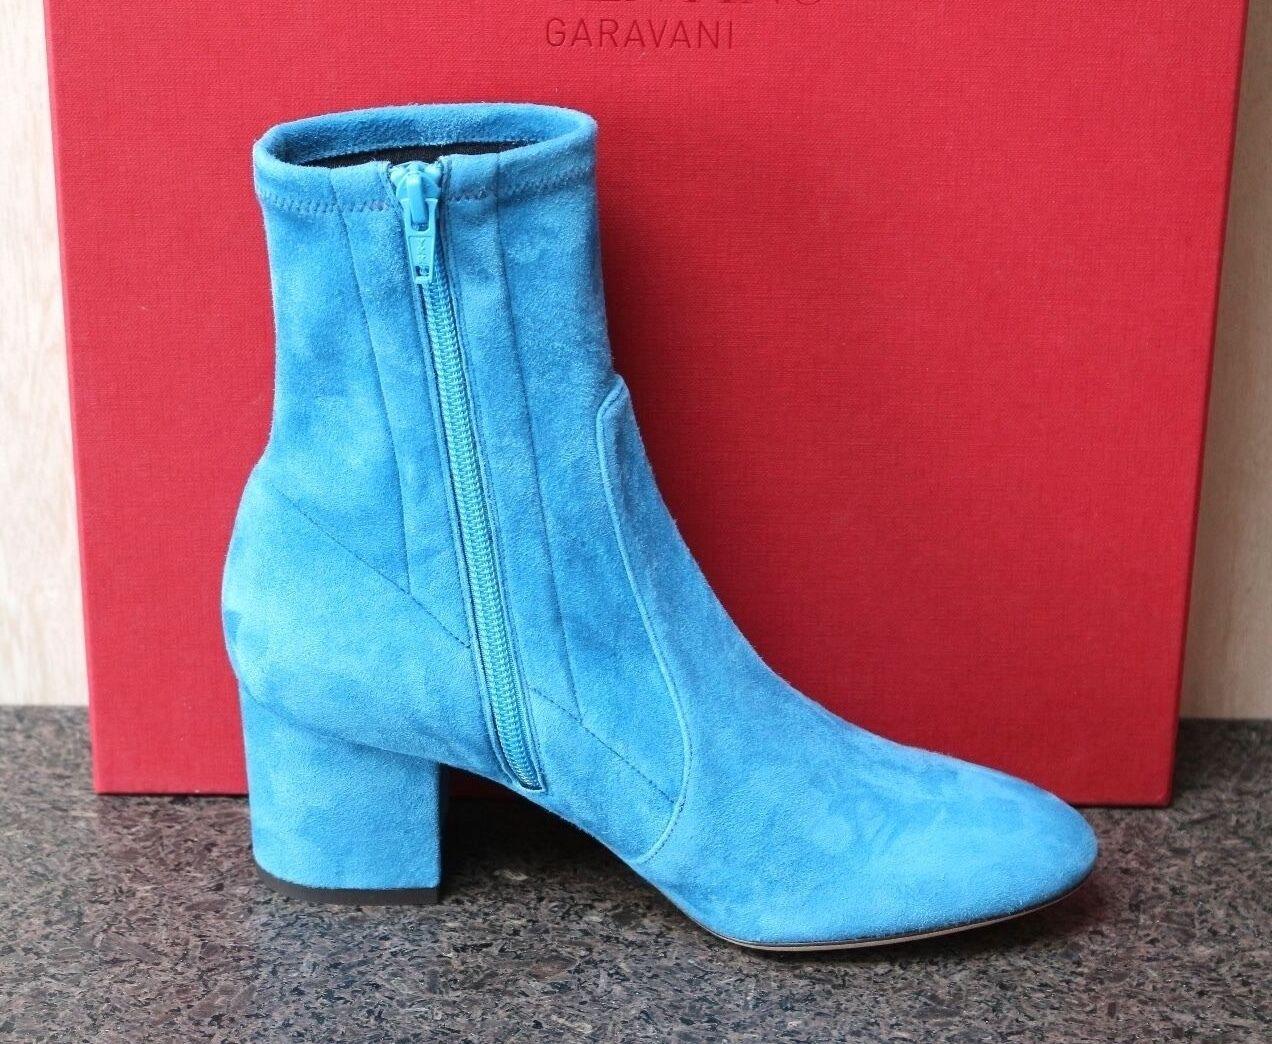 NIB VALENTINO GARAVANI LIGHT bleu SUEDE MOD ZIPPER ANKLE démarrageIES bottes 36.5